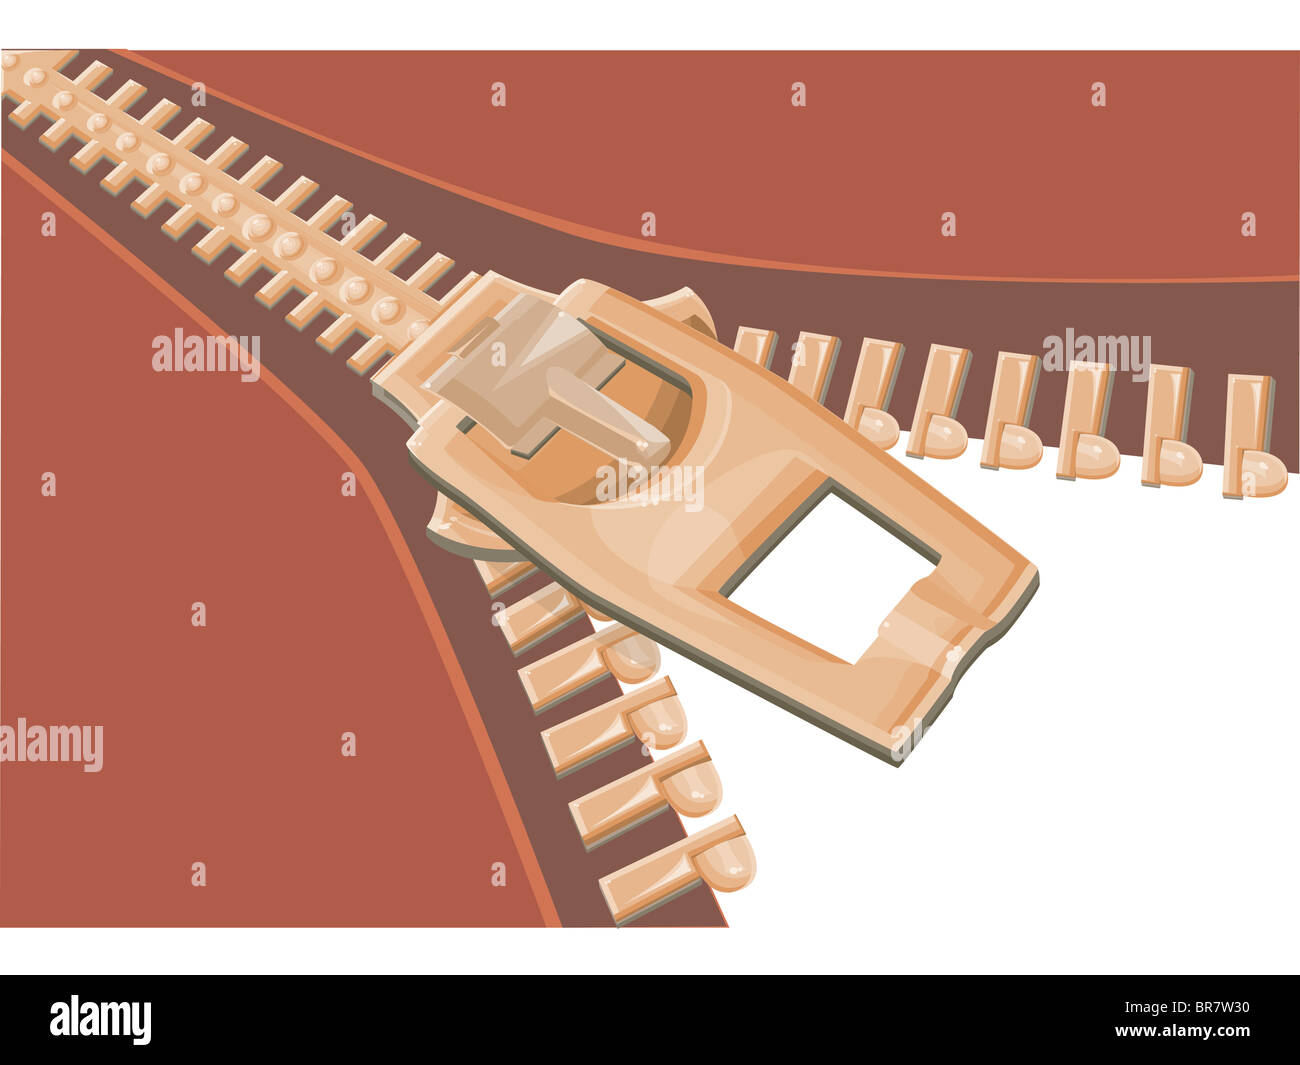 Illustration of a zipper - Stock Image